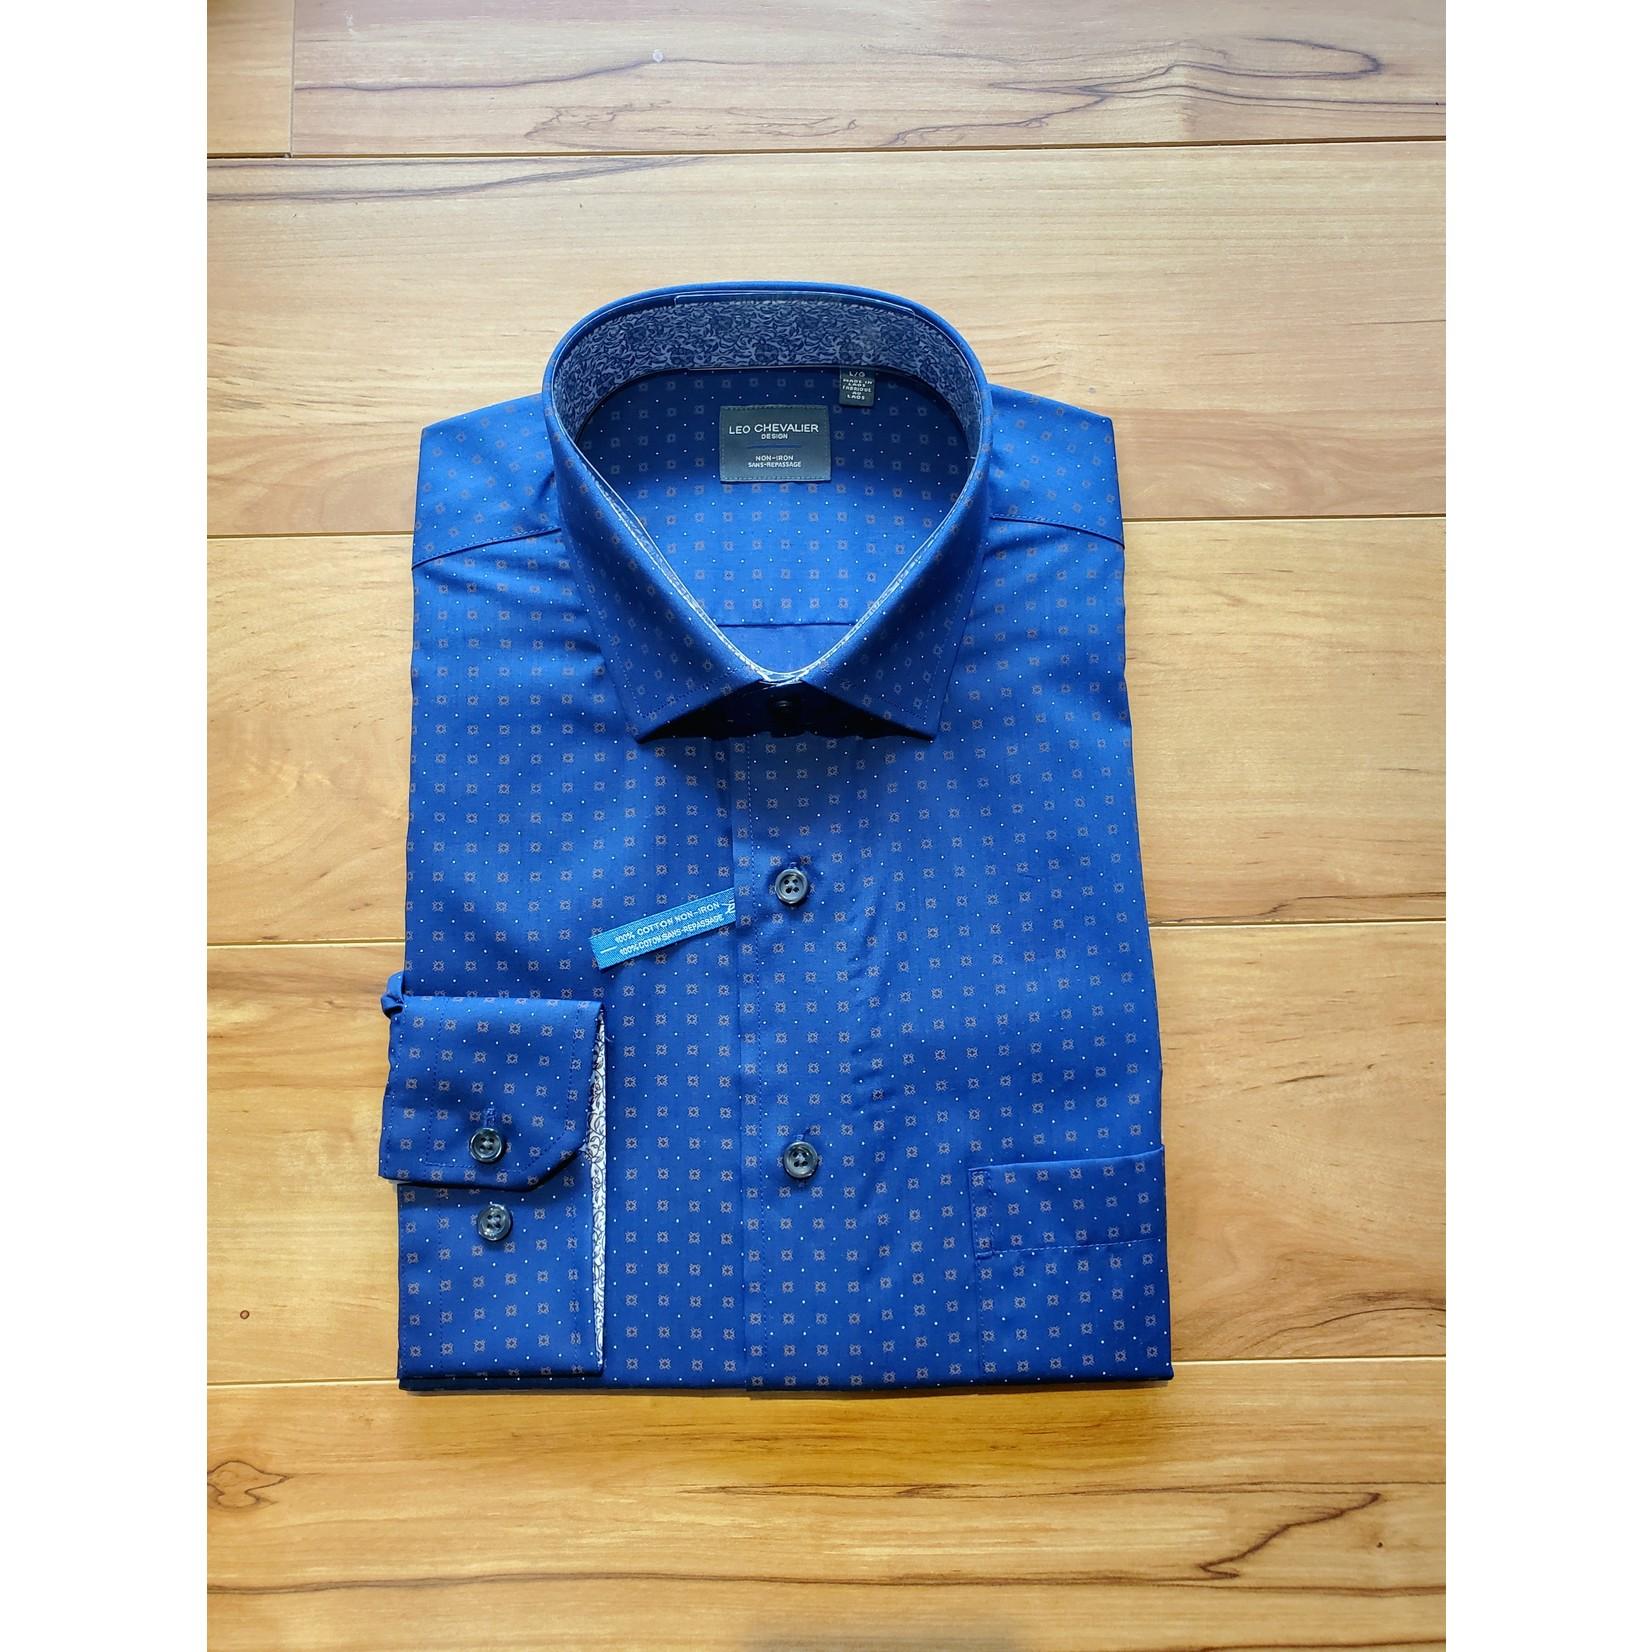 Leo Chevalier Leo Chevalier 527450 Longsleeve Sportshirt - 1898 Oxford Blue